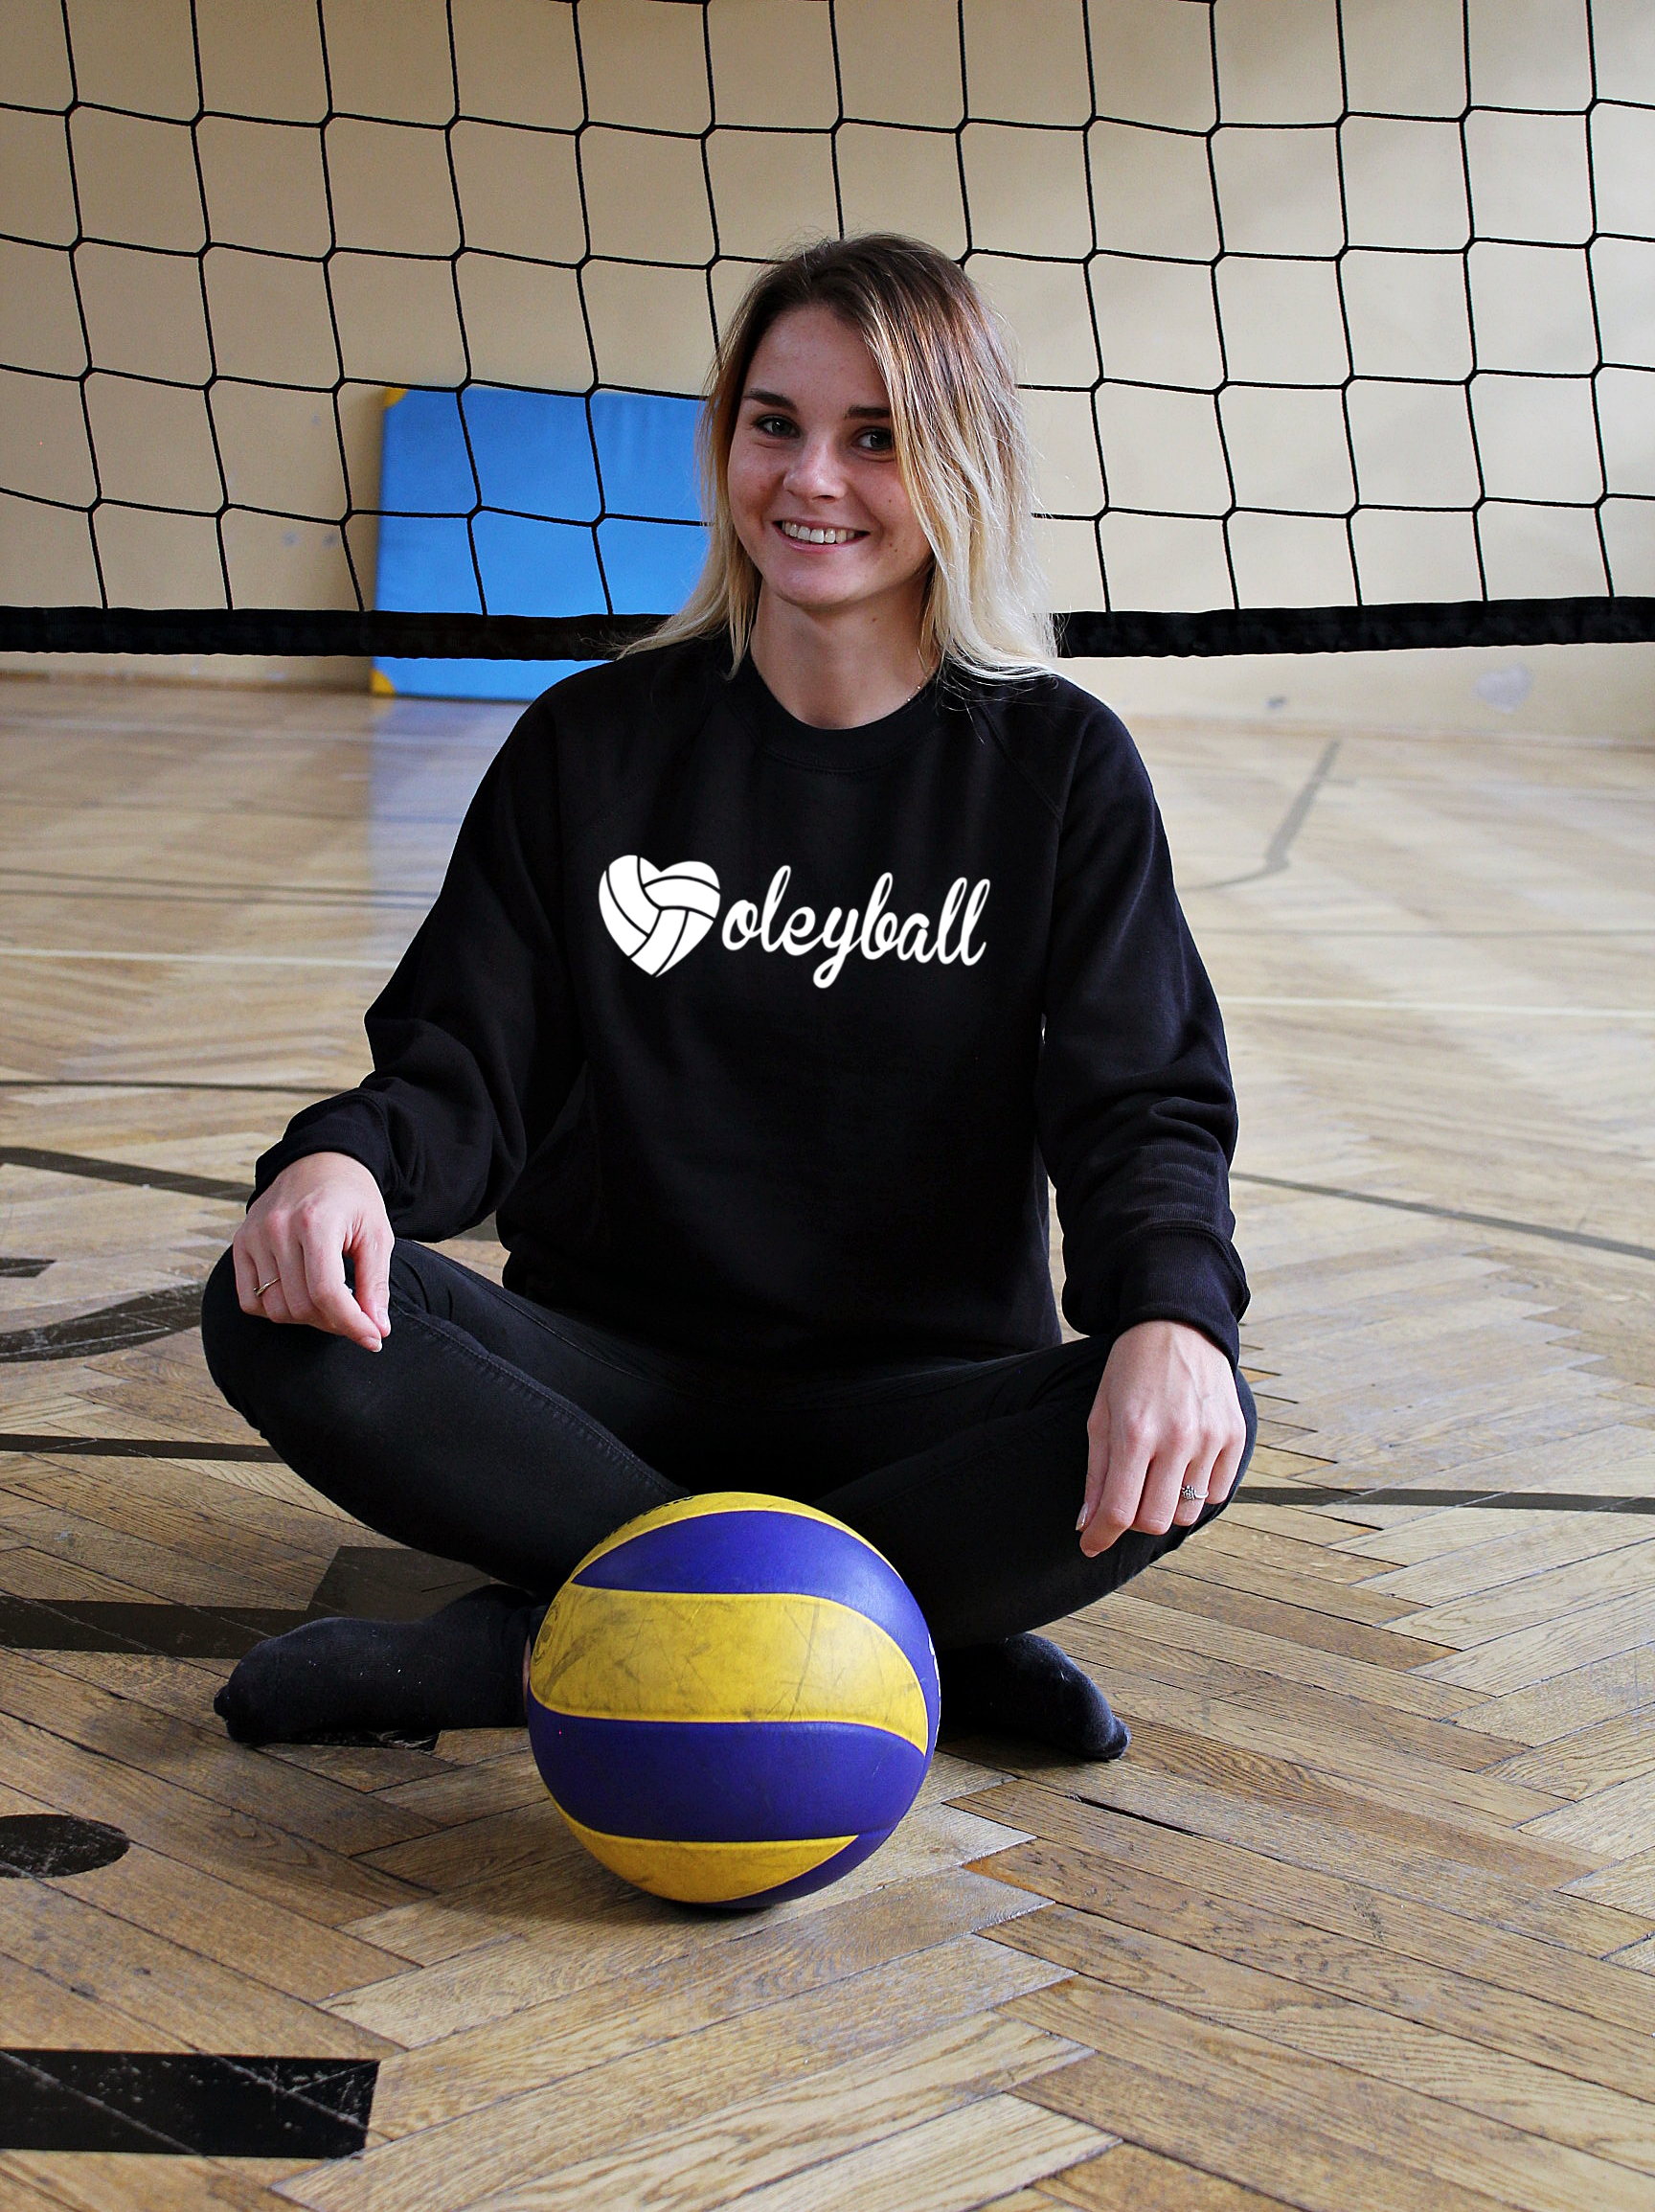 8b3f6b6b7 Bluza VOLLEYBALL napis heart siatkówka. volleyball napis czarna zdj 2.png.  volleyball napis czarna zdj 2.png ...